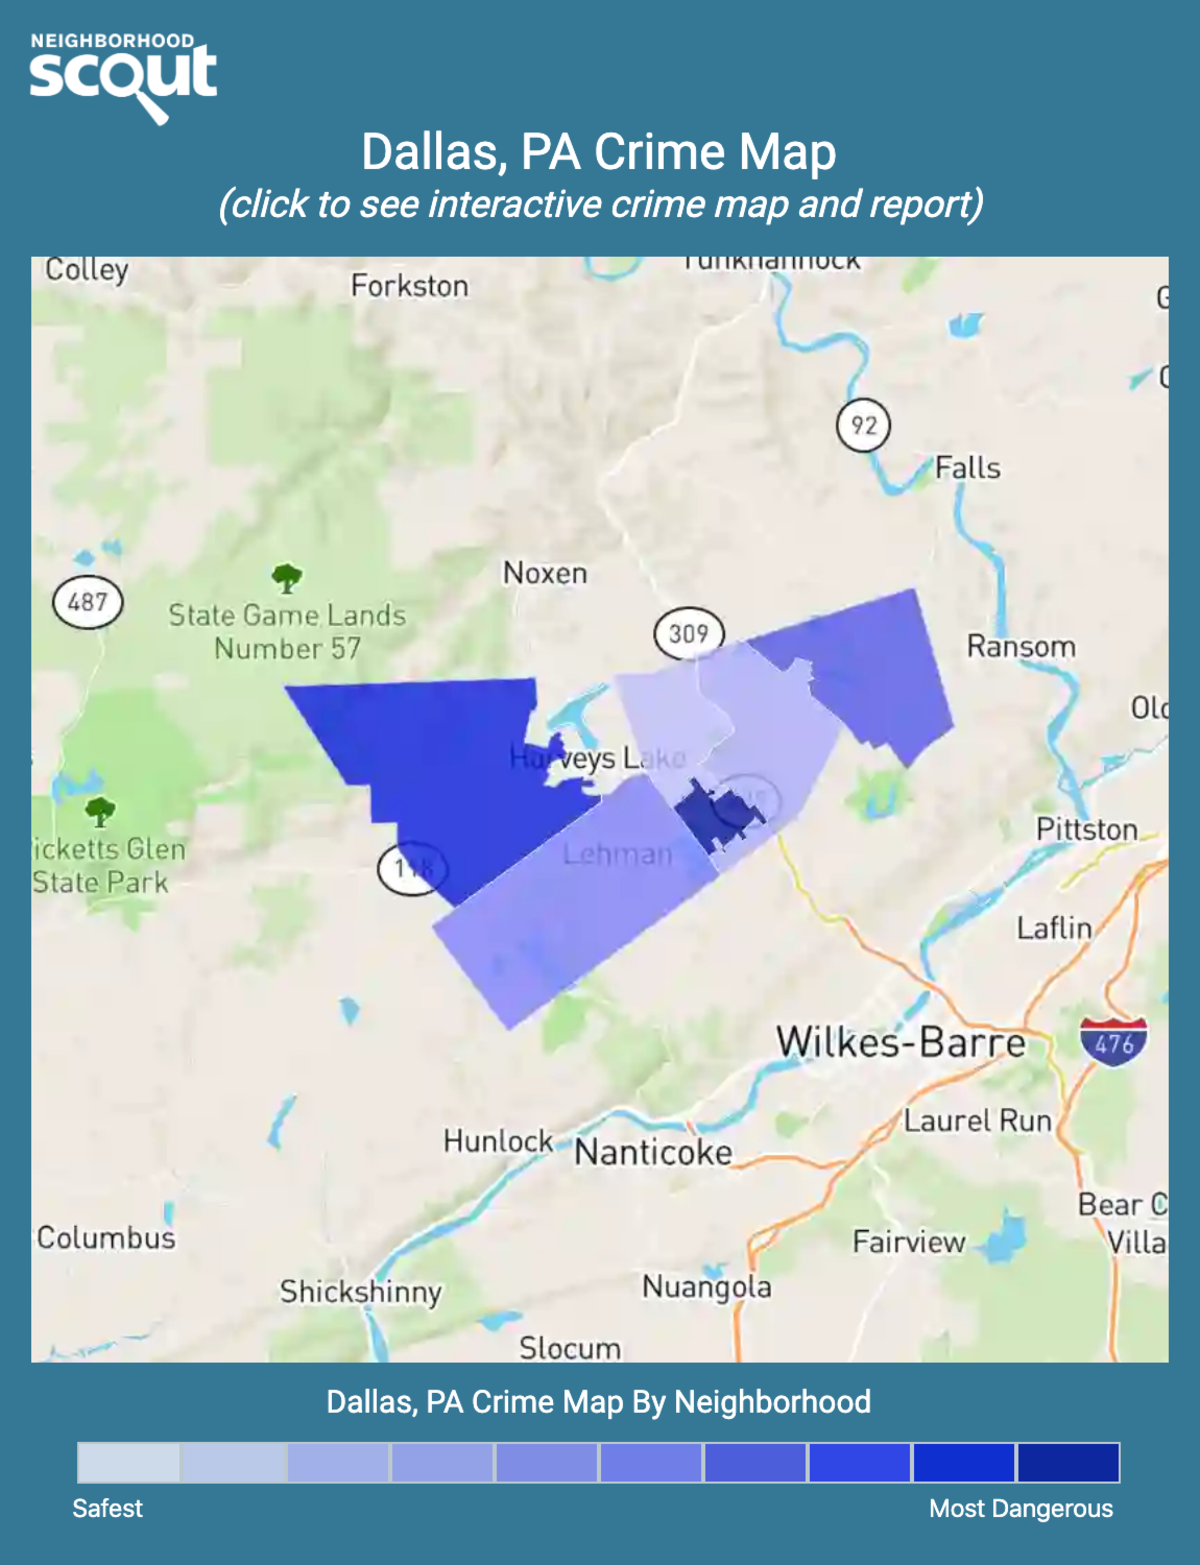 Dallas, Pennsylvania crime map